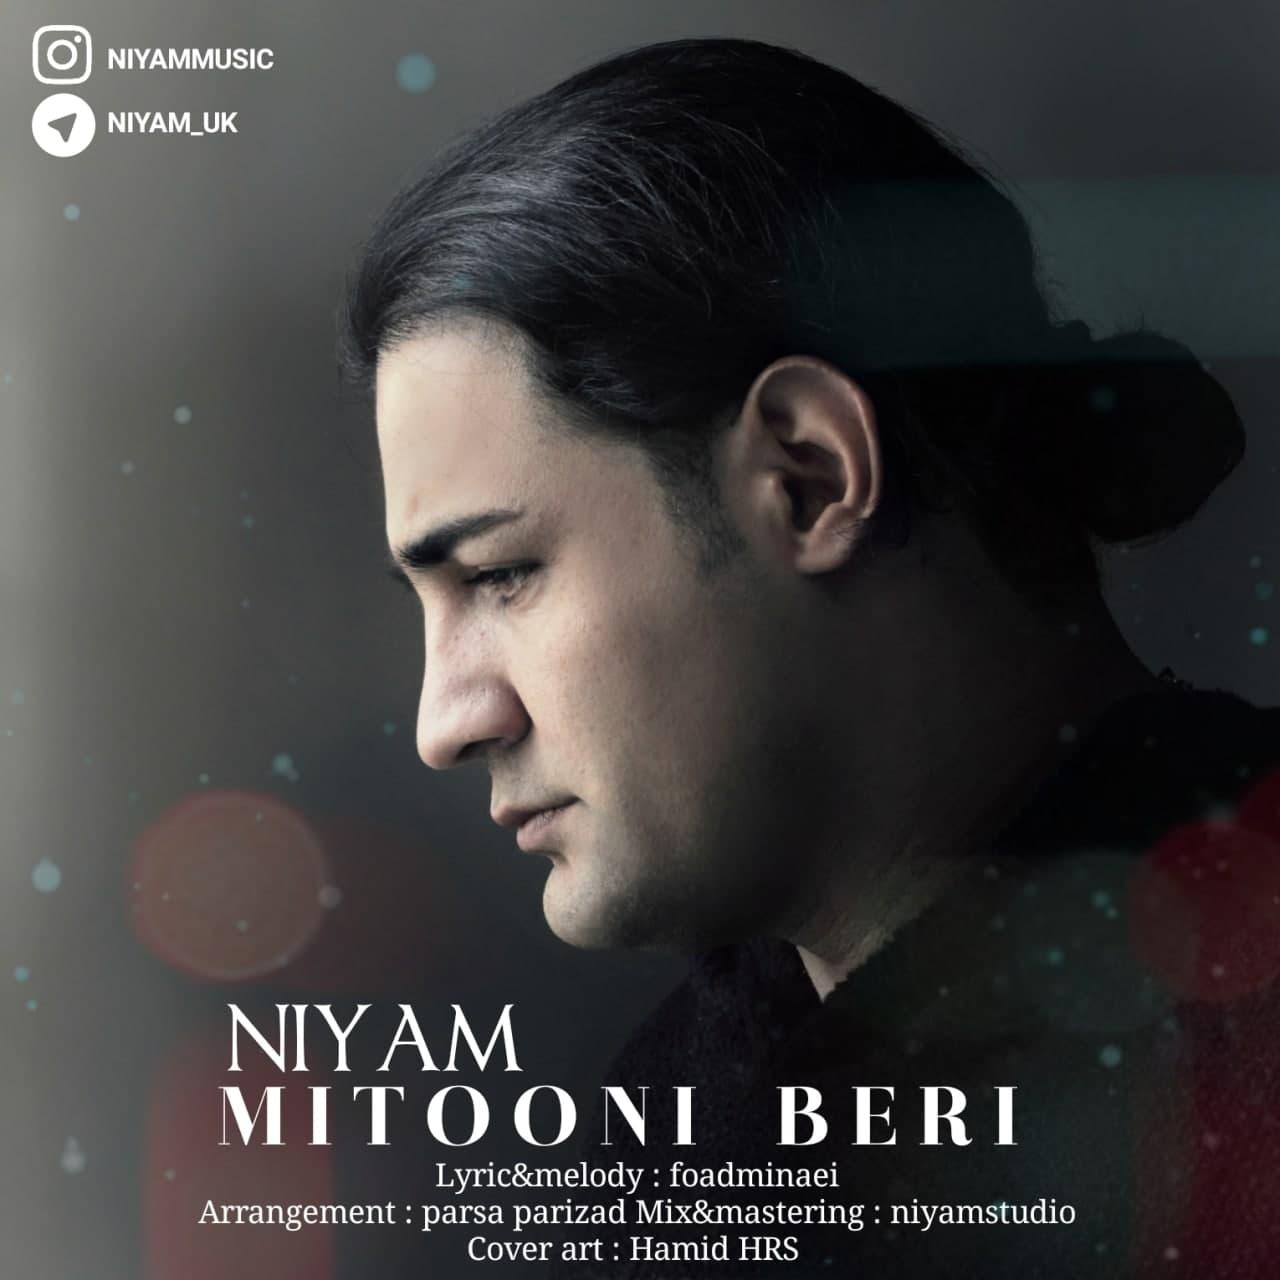 Niyam - Mitooni Beri